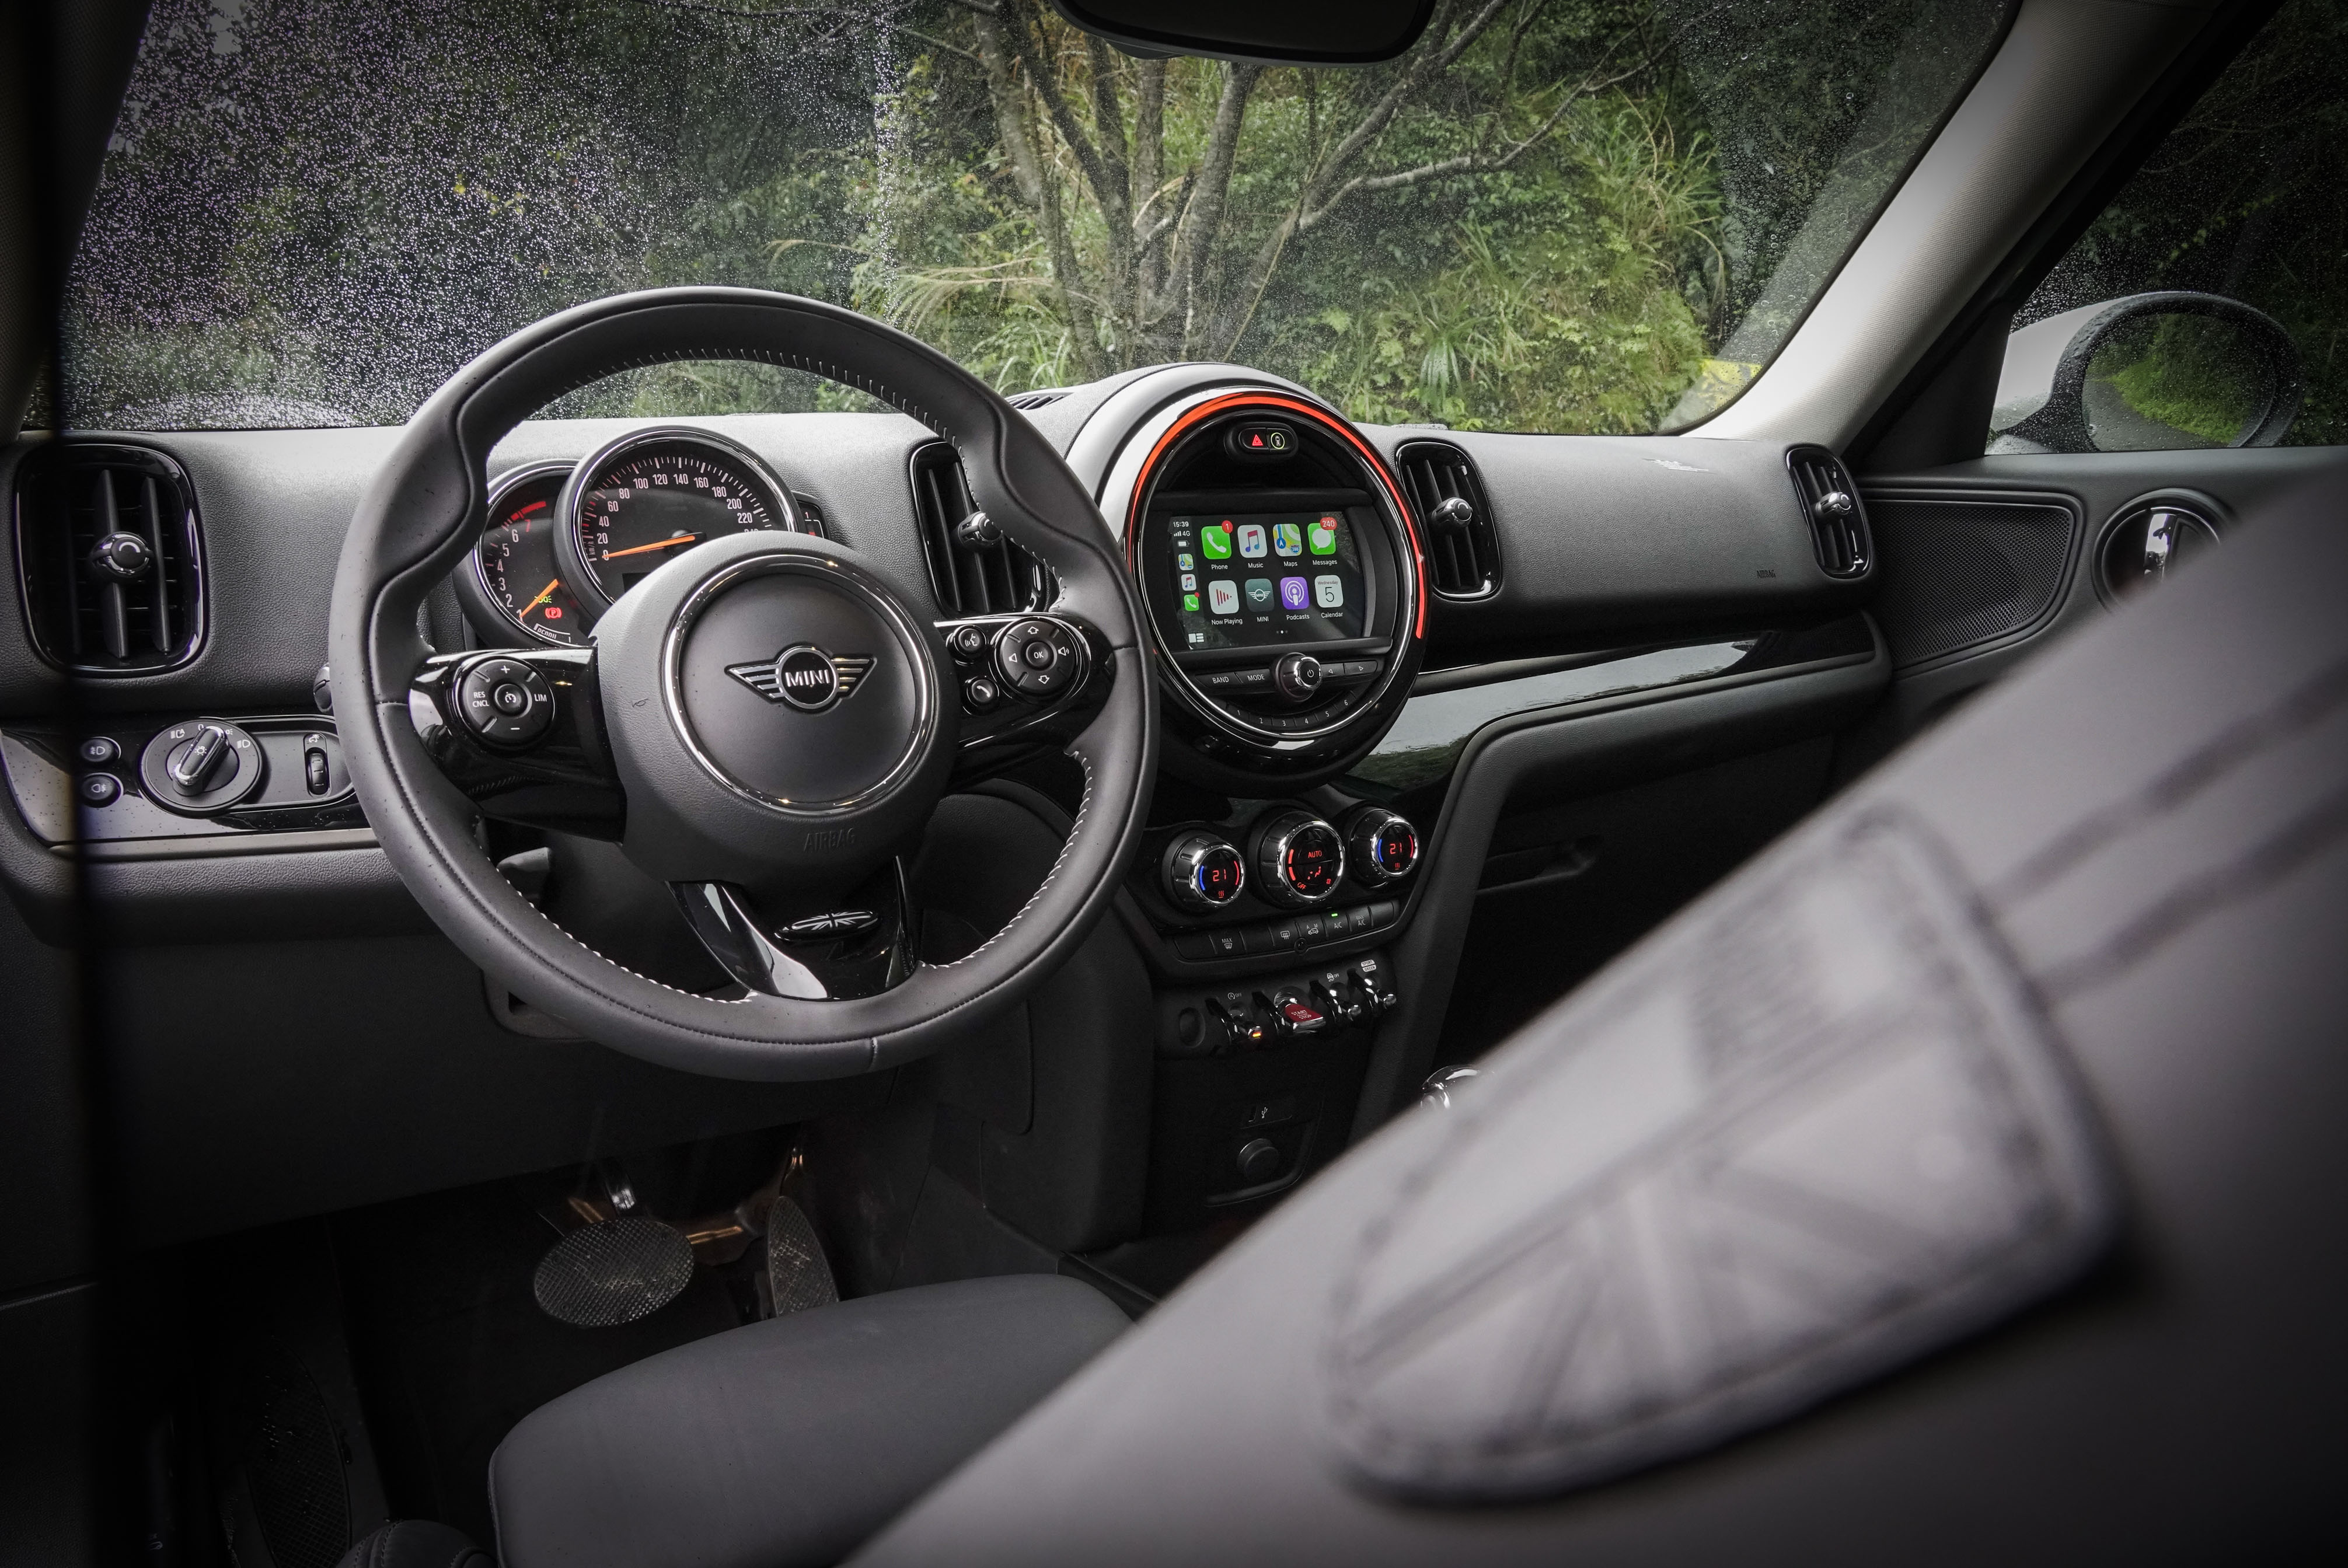 MINI Yours 跑車式真皮方向盤為豪華野營版內容之一。試駕車搭配 Piano Black 內裝飾板、氣氛燈光及 LED 中央儀錶飾環。